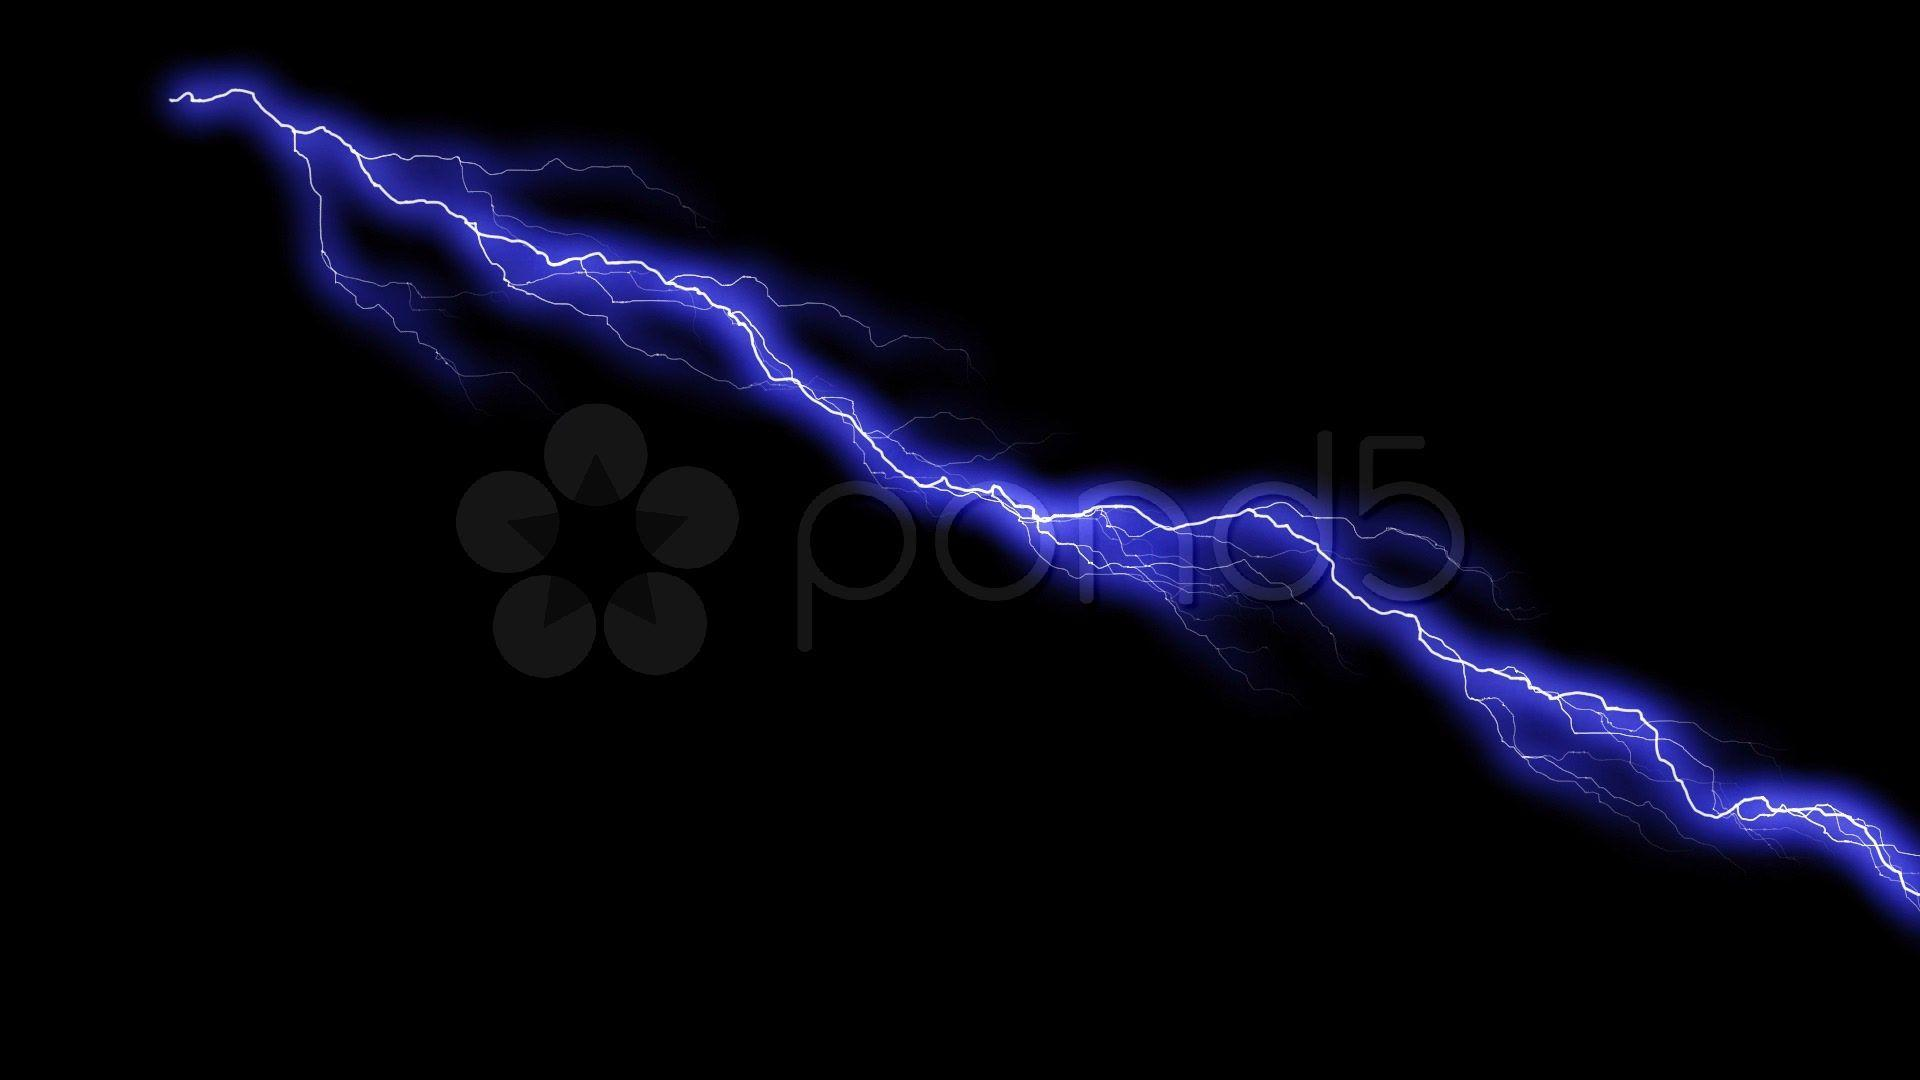 Lightning Bolt Backgrounds Wallpaper Cave